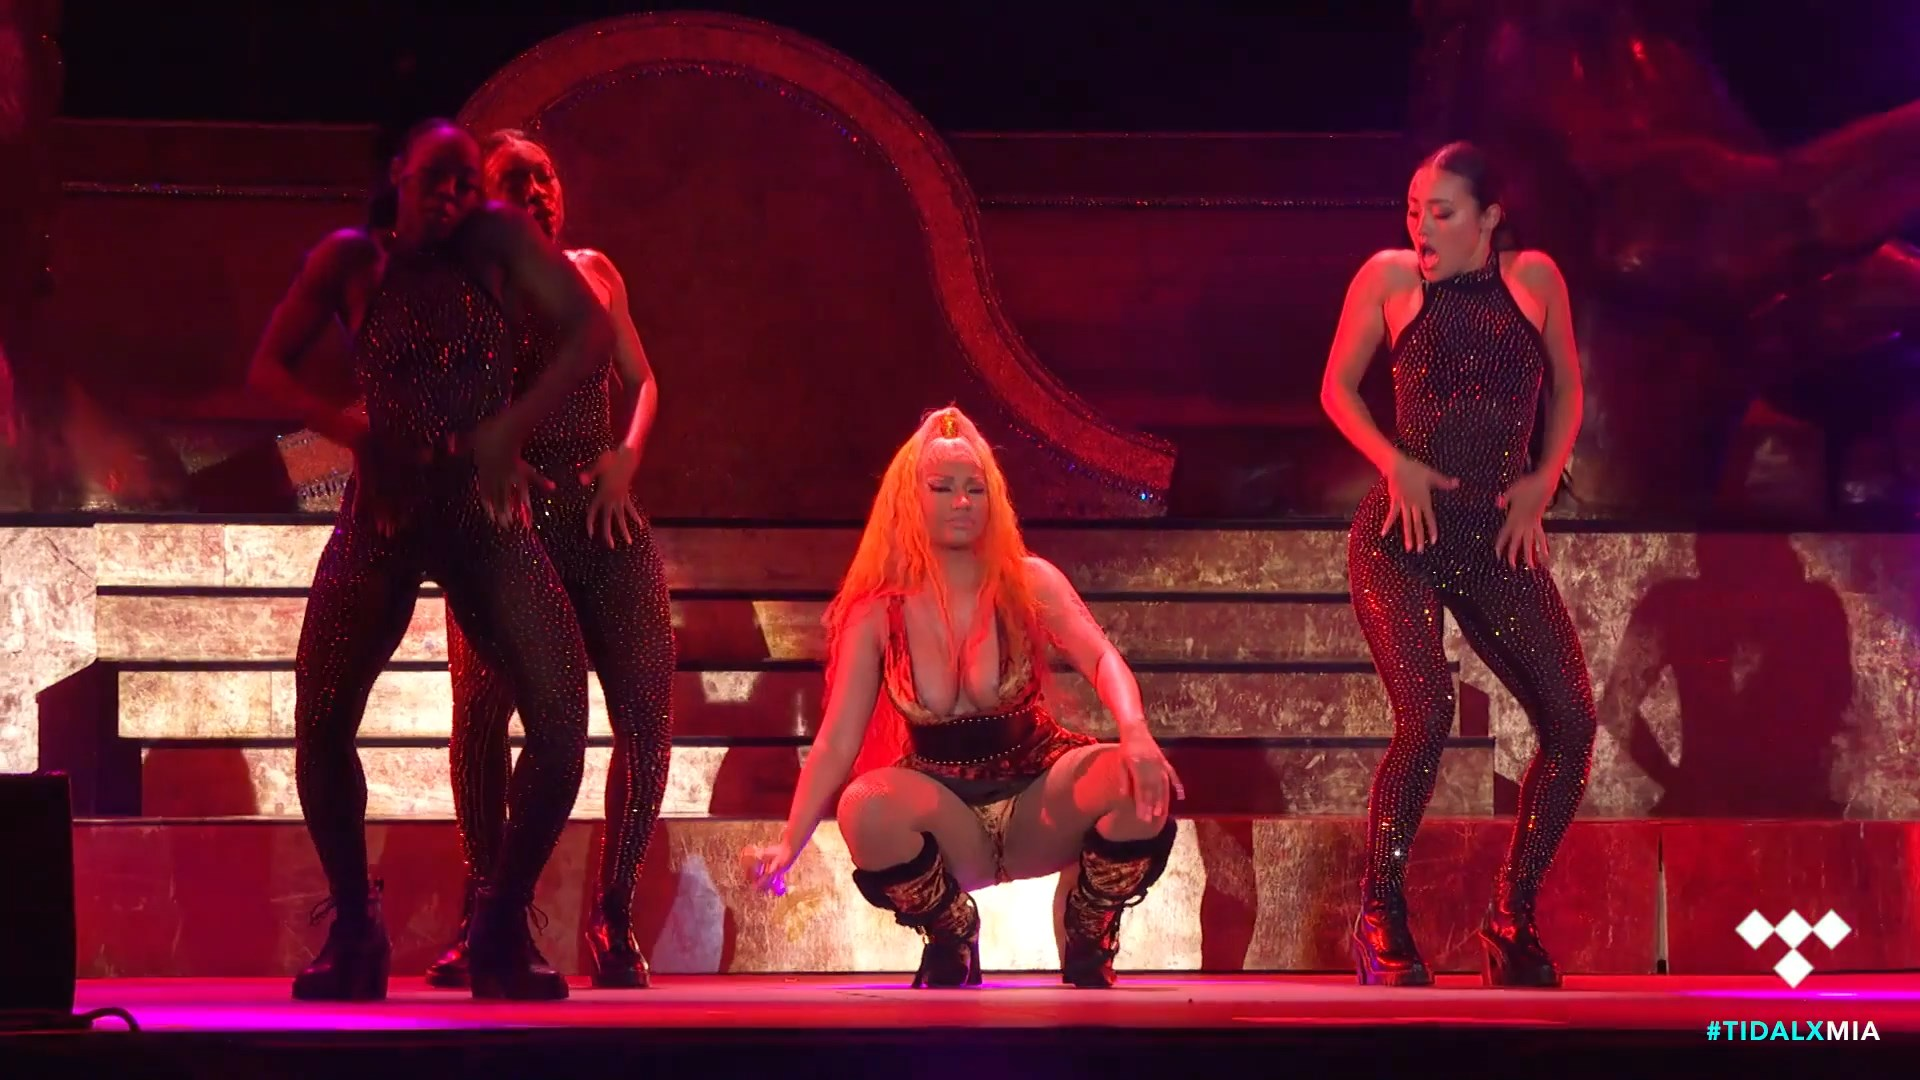 Nicki-Minaj-Nude-TheFappeningBlog.com-23.jpg